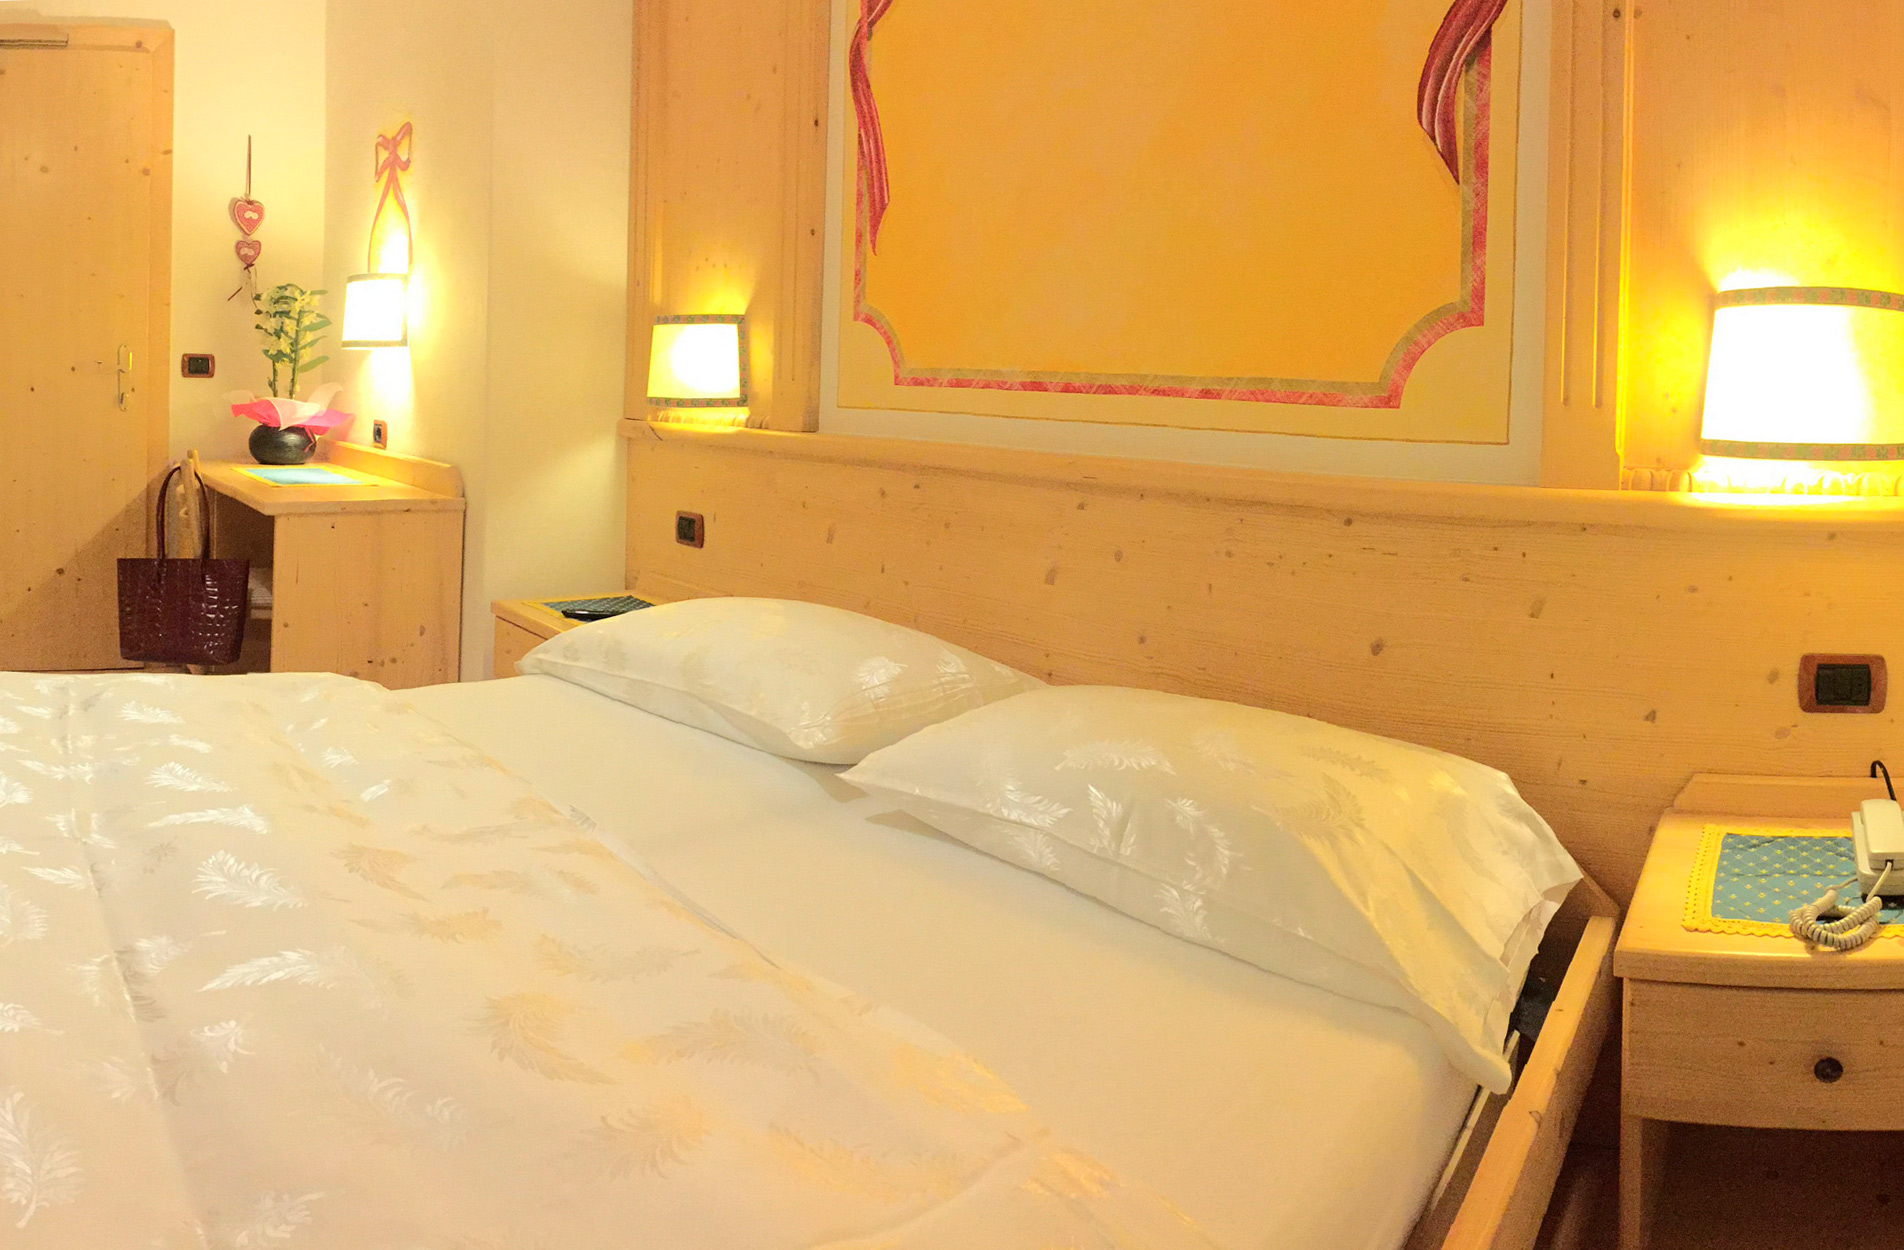 Hotel_miravalle_doppia_ok01